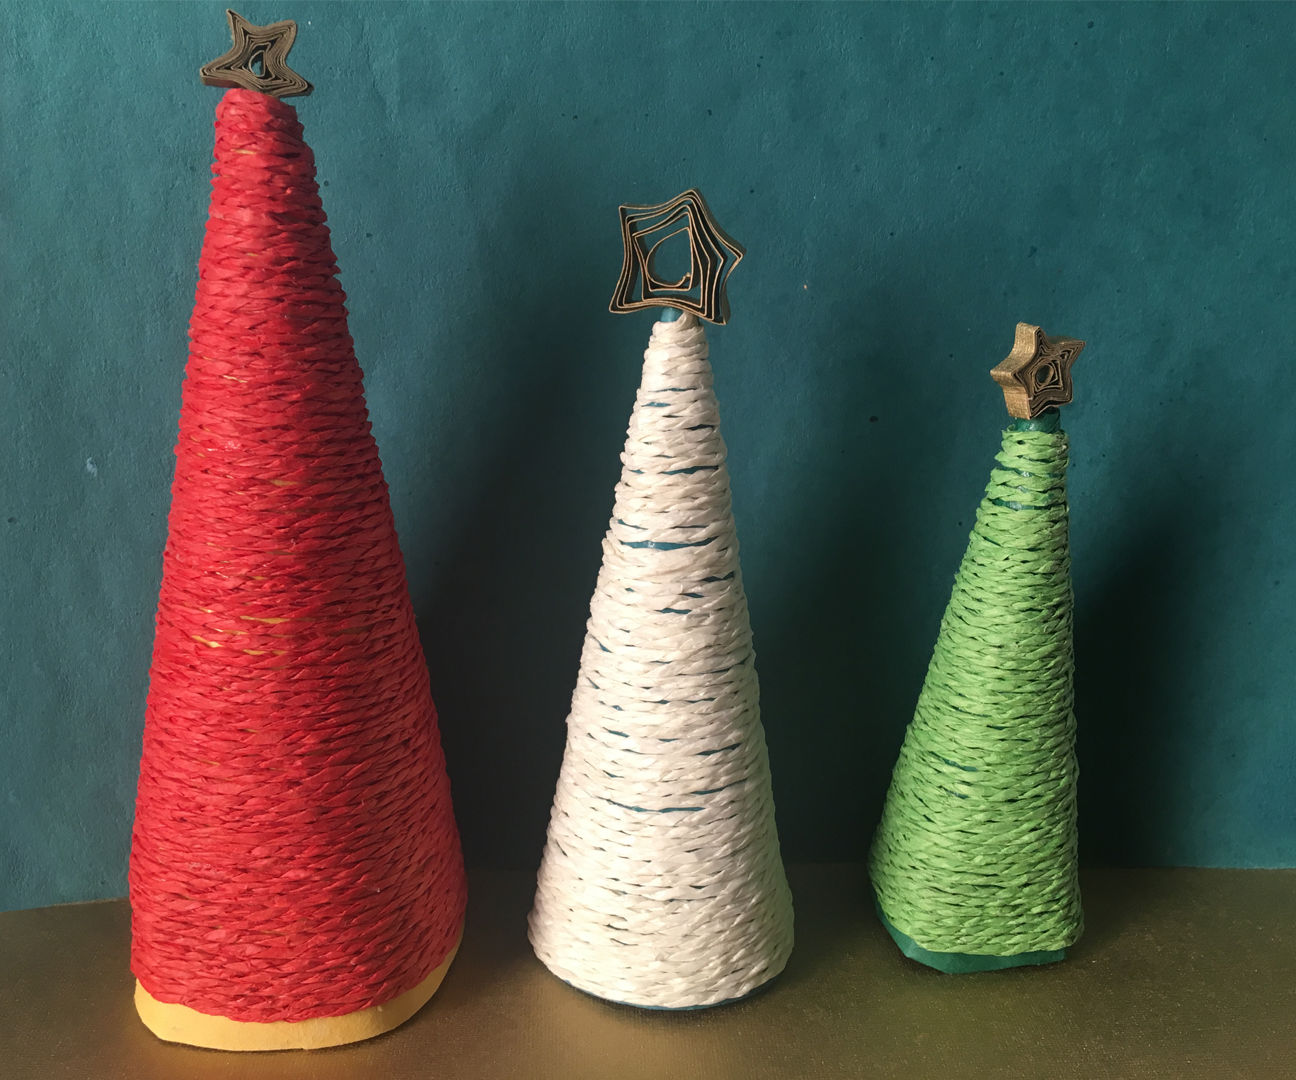 How To Make A Christmas Tree | DIY Miniature Christmas Tree | DIY Christmas Home Decor